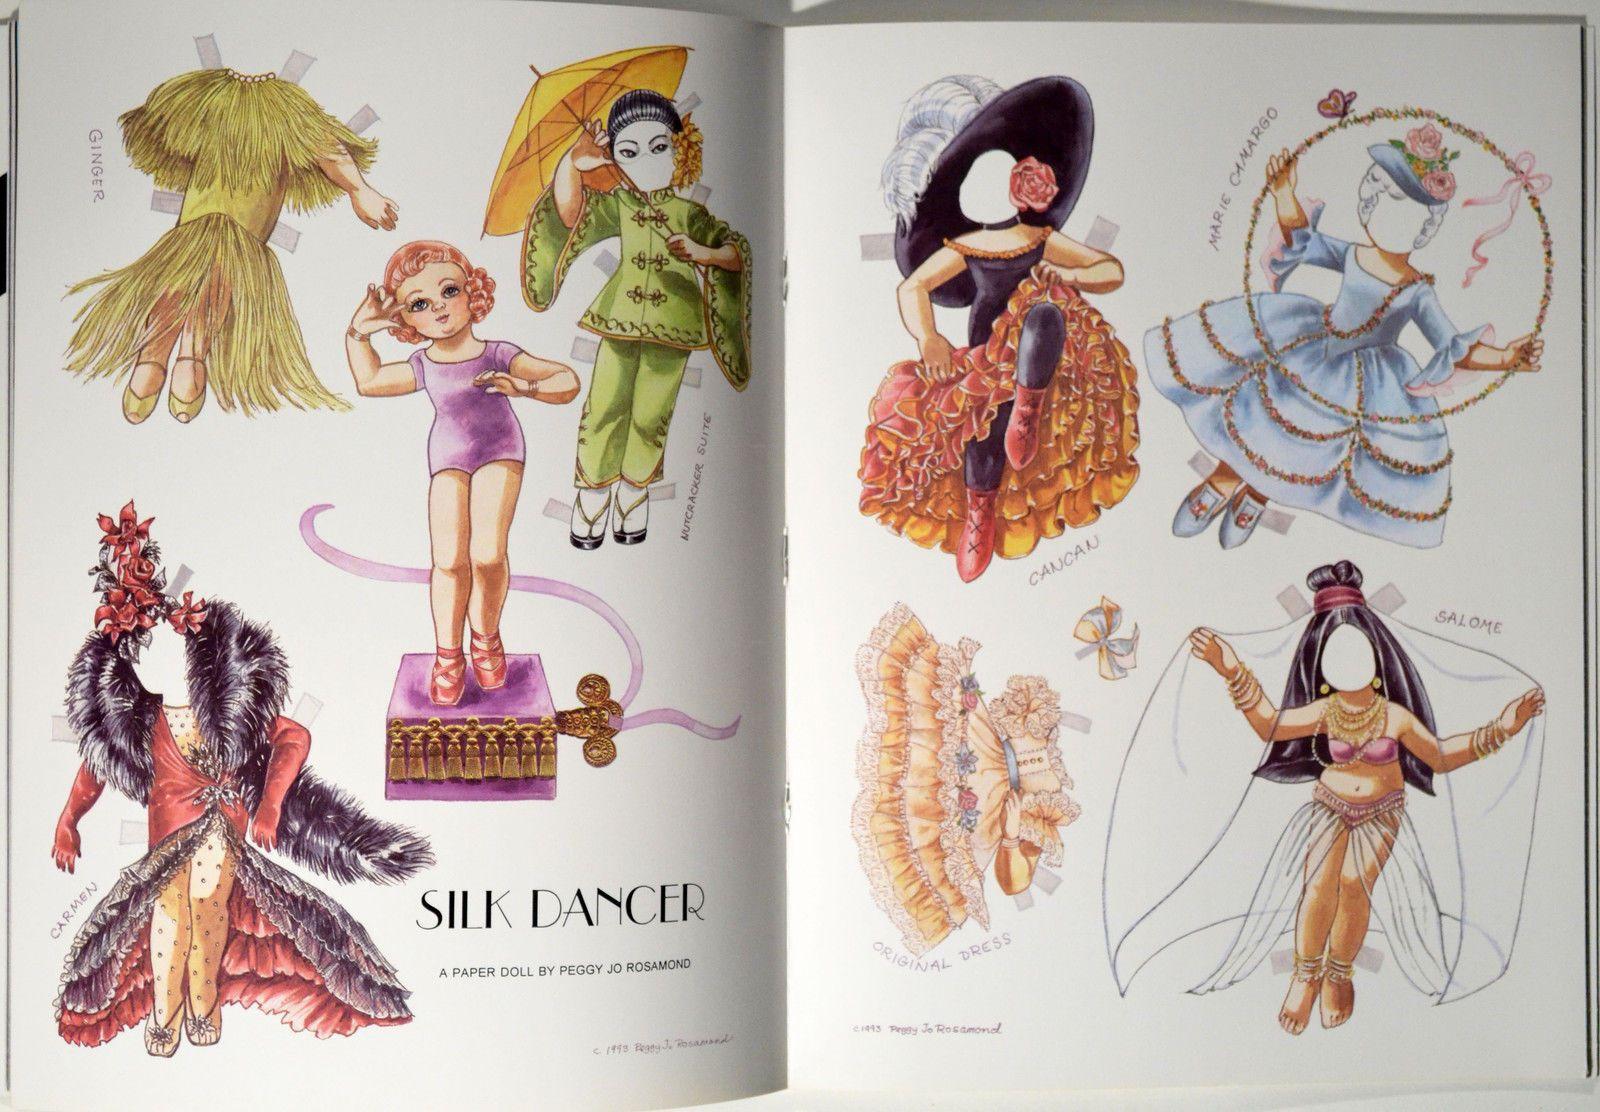 Doll News Magazine UFDC Back Issue Winter 1994 w Silk Dancer Paper Doll | eBay